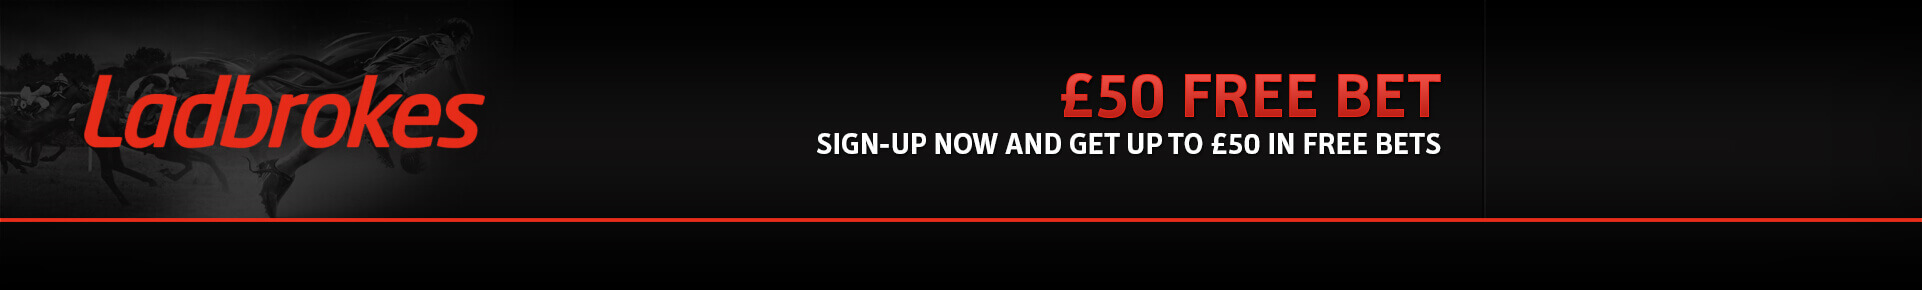 Boxing betting ladbrokes plc sports betting web templates